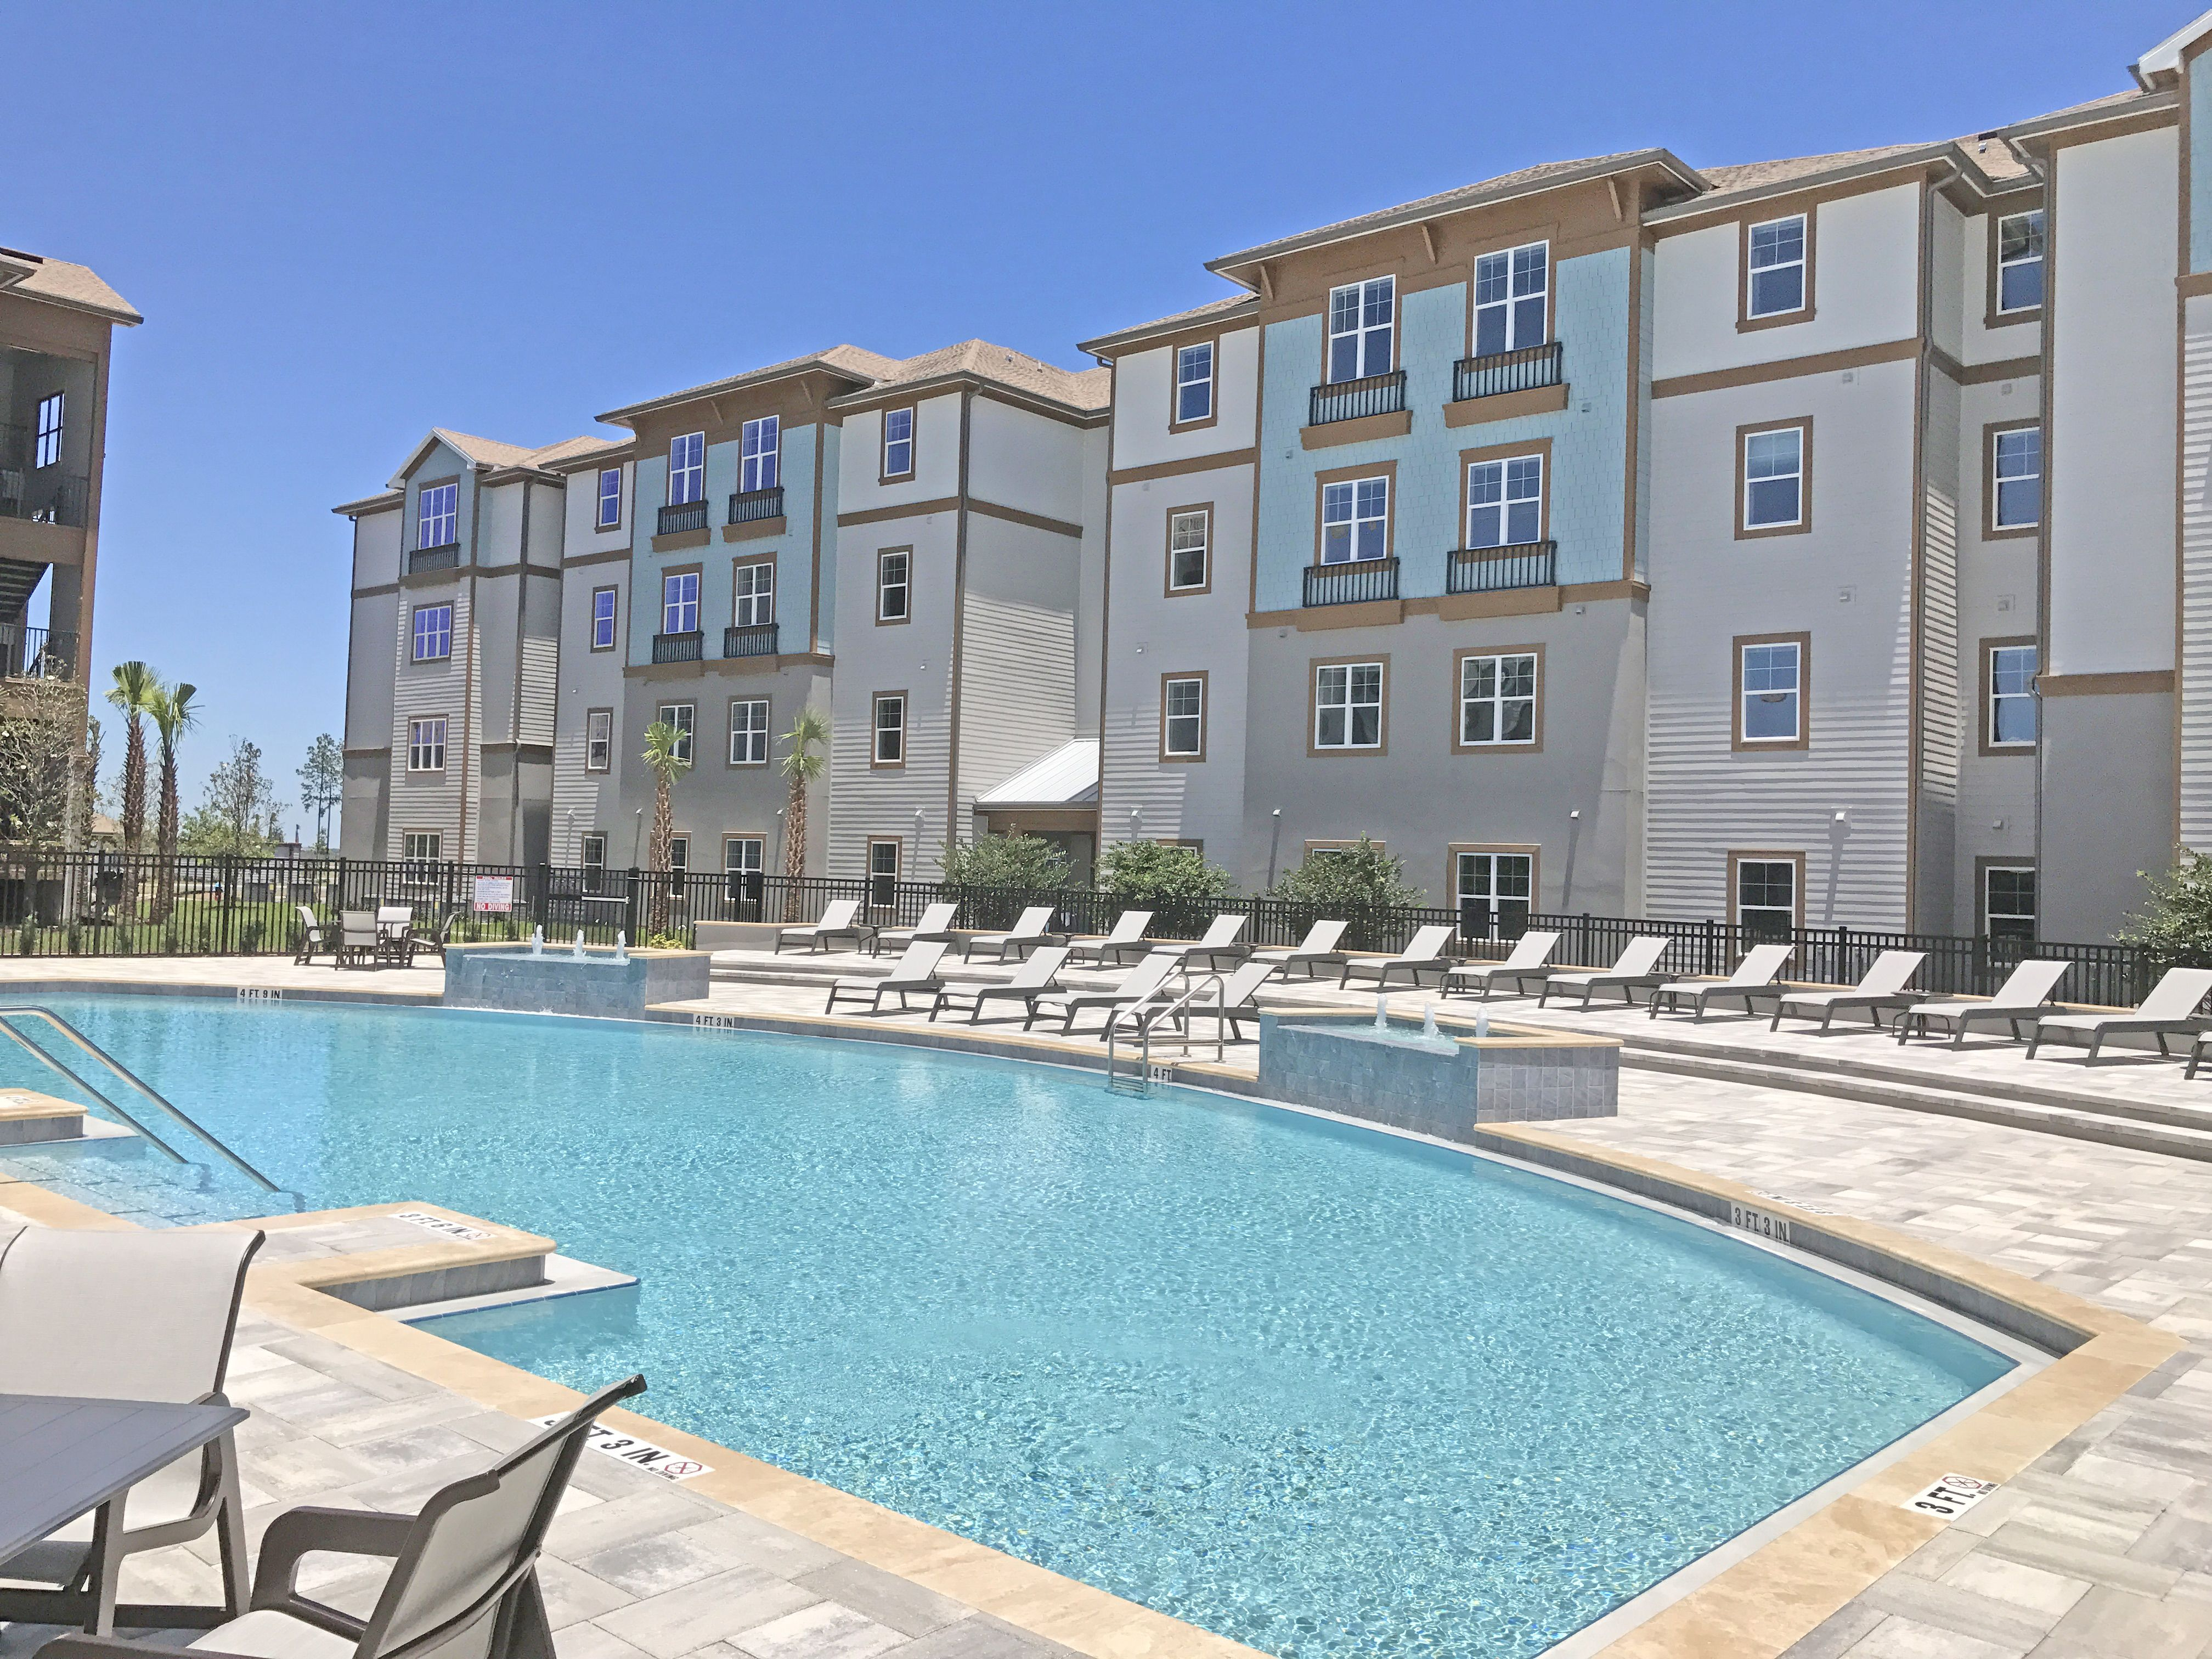 Marden Ridge is a BRAND NEW, resort style apartment